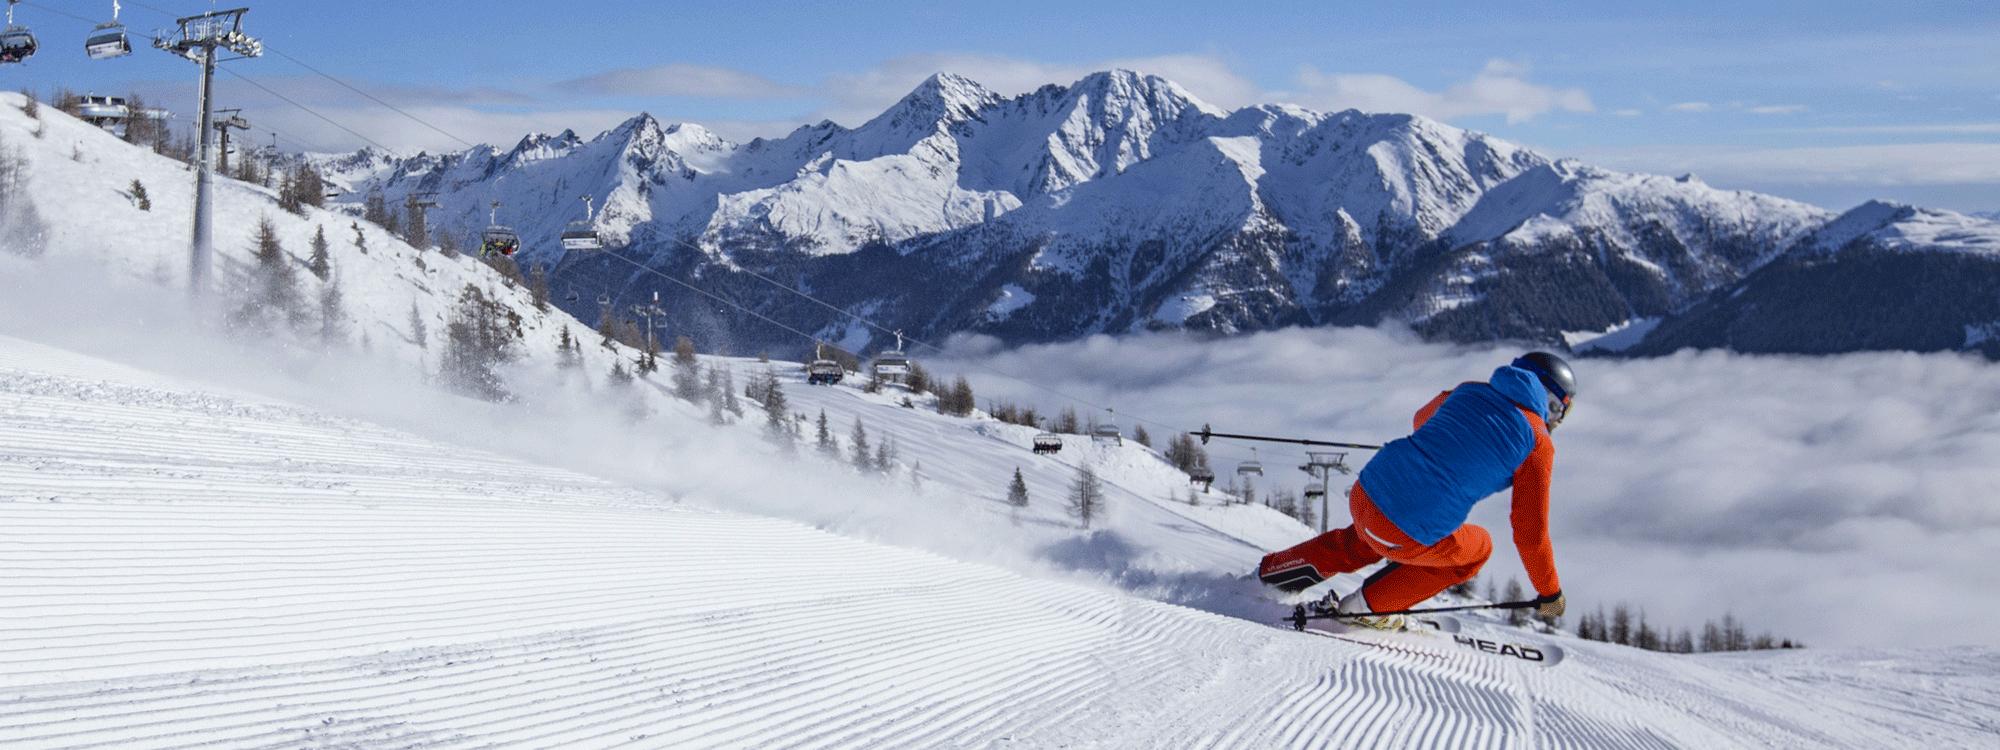 skifahren_sillian